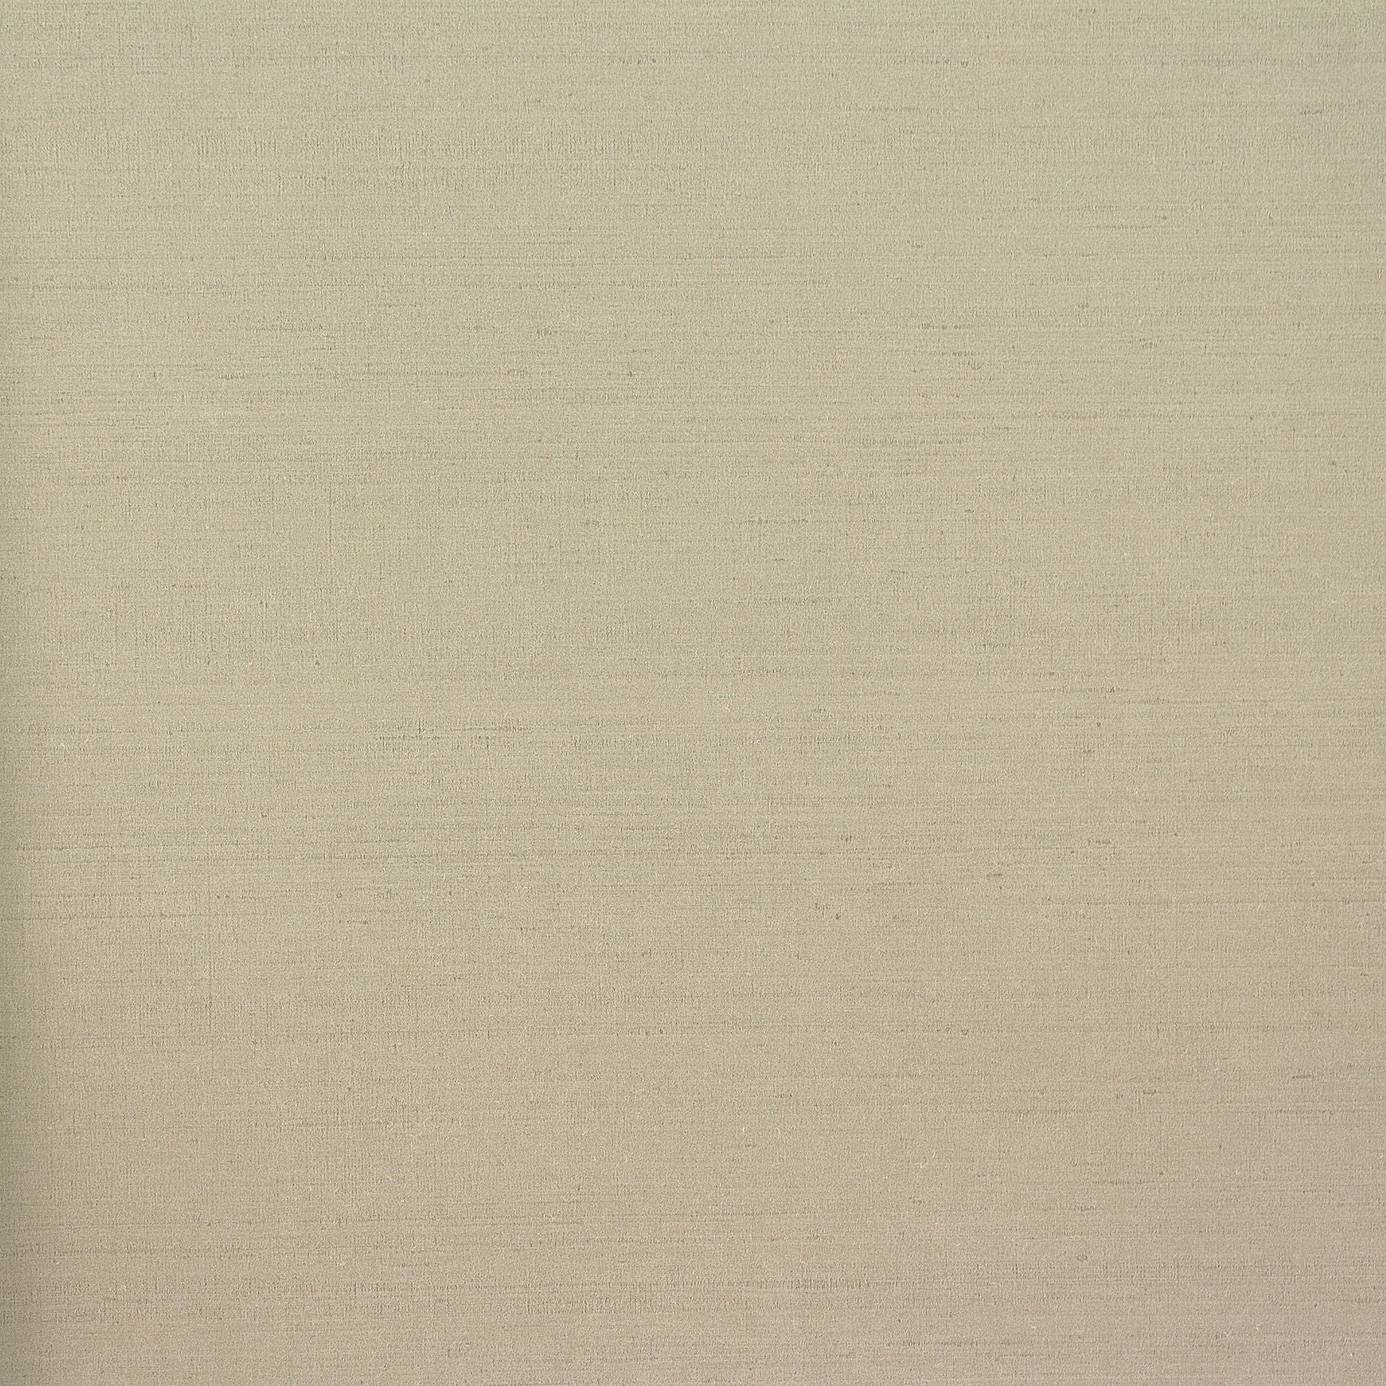 Американские обои Prestigious,  коллекция Galleria, артикул1606/031